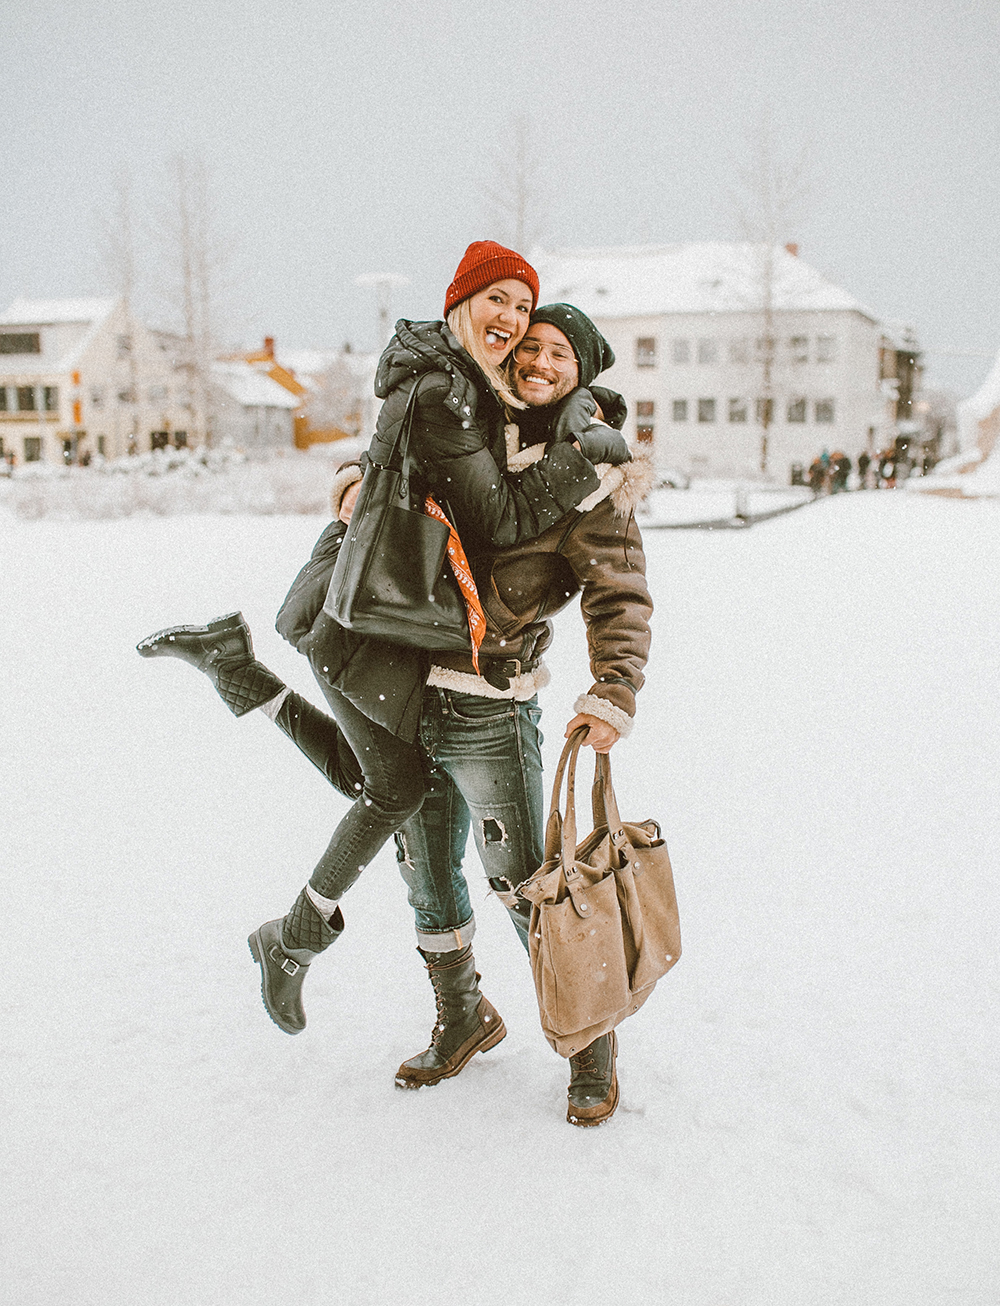 1-livvyland-blog-olivia-watson-travel-lifestyle-blogger-iceland-road-trip-what-to-do-pack-reykjavik-noken-travel-guide-Hallgrimskirkja-church-best-friends